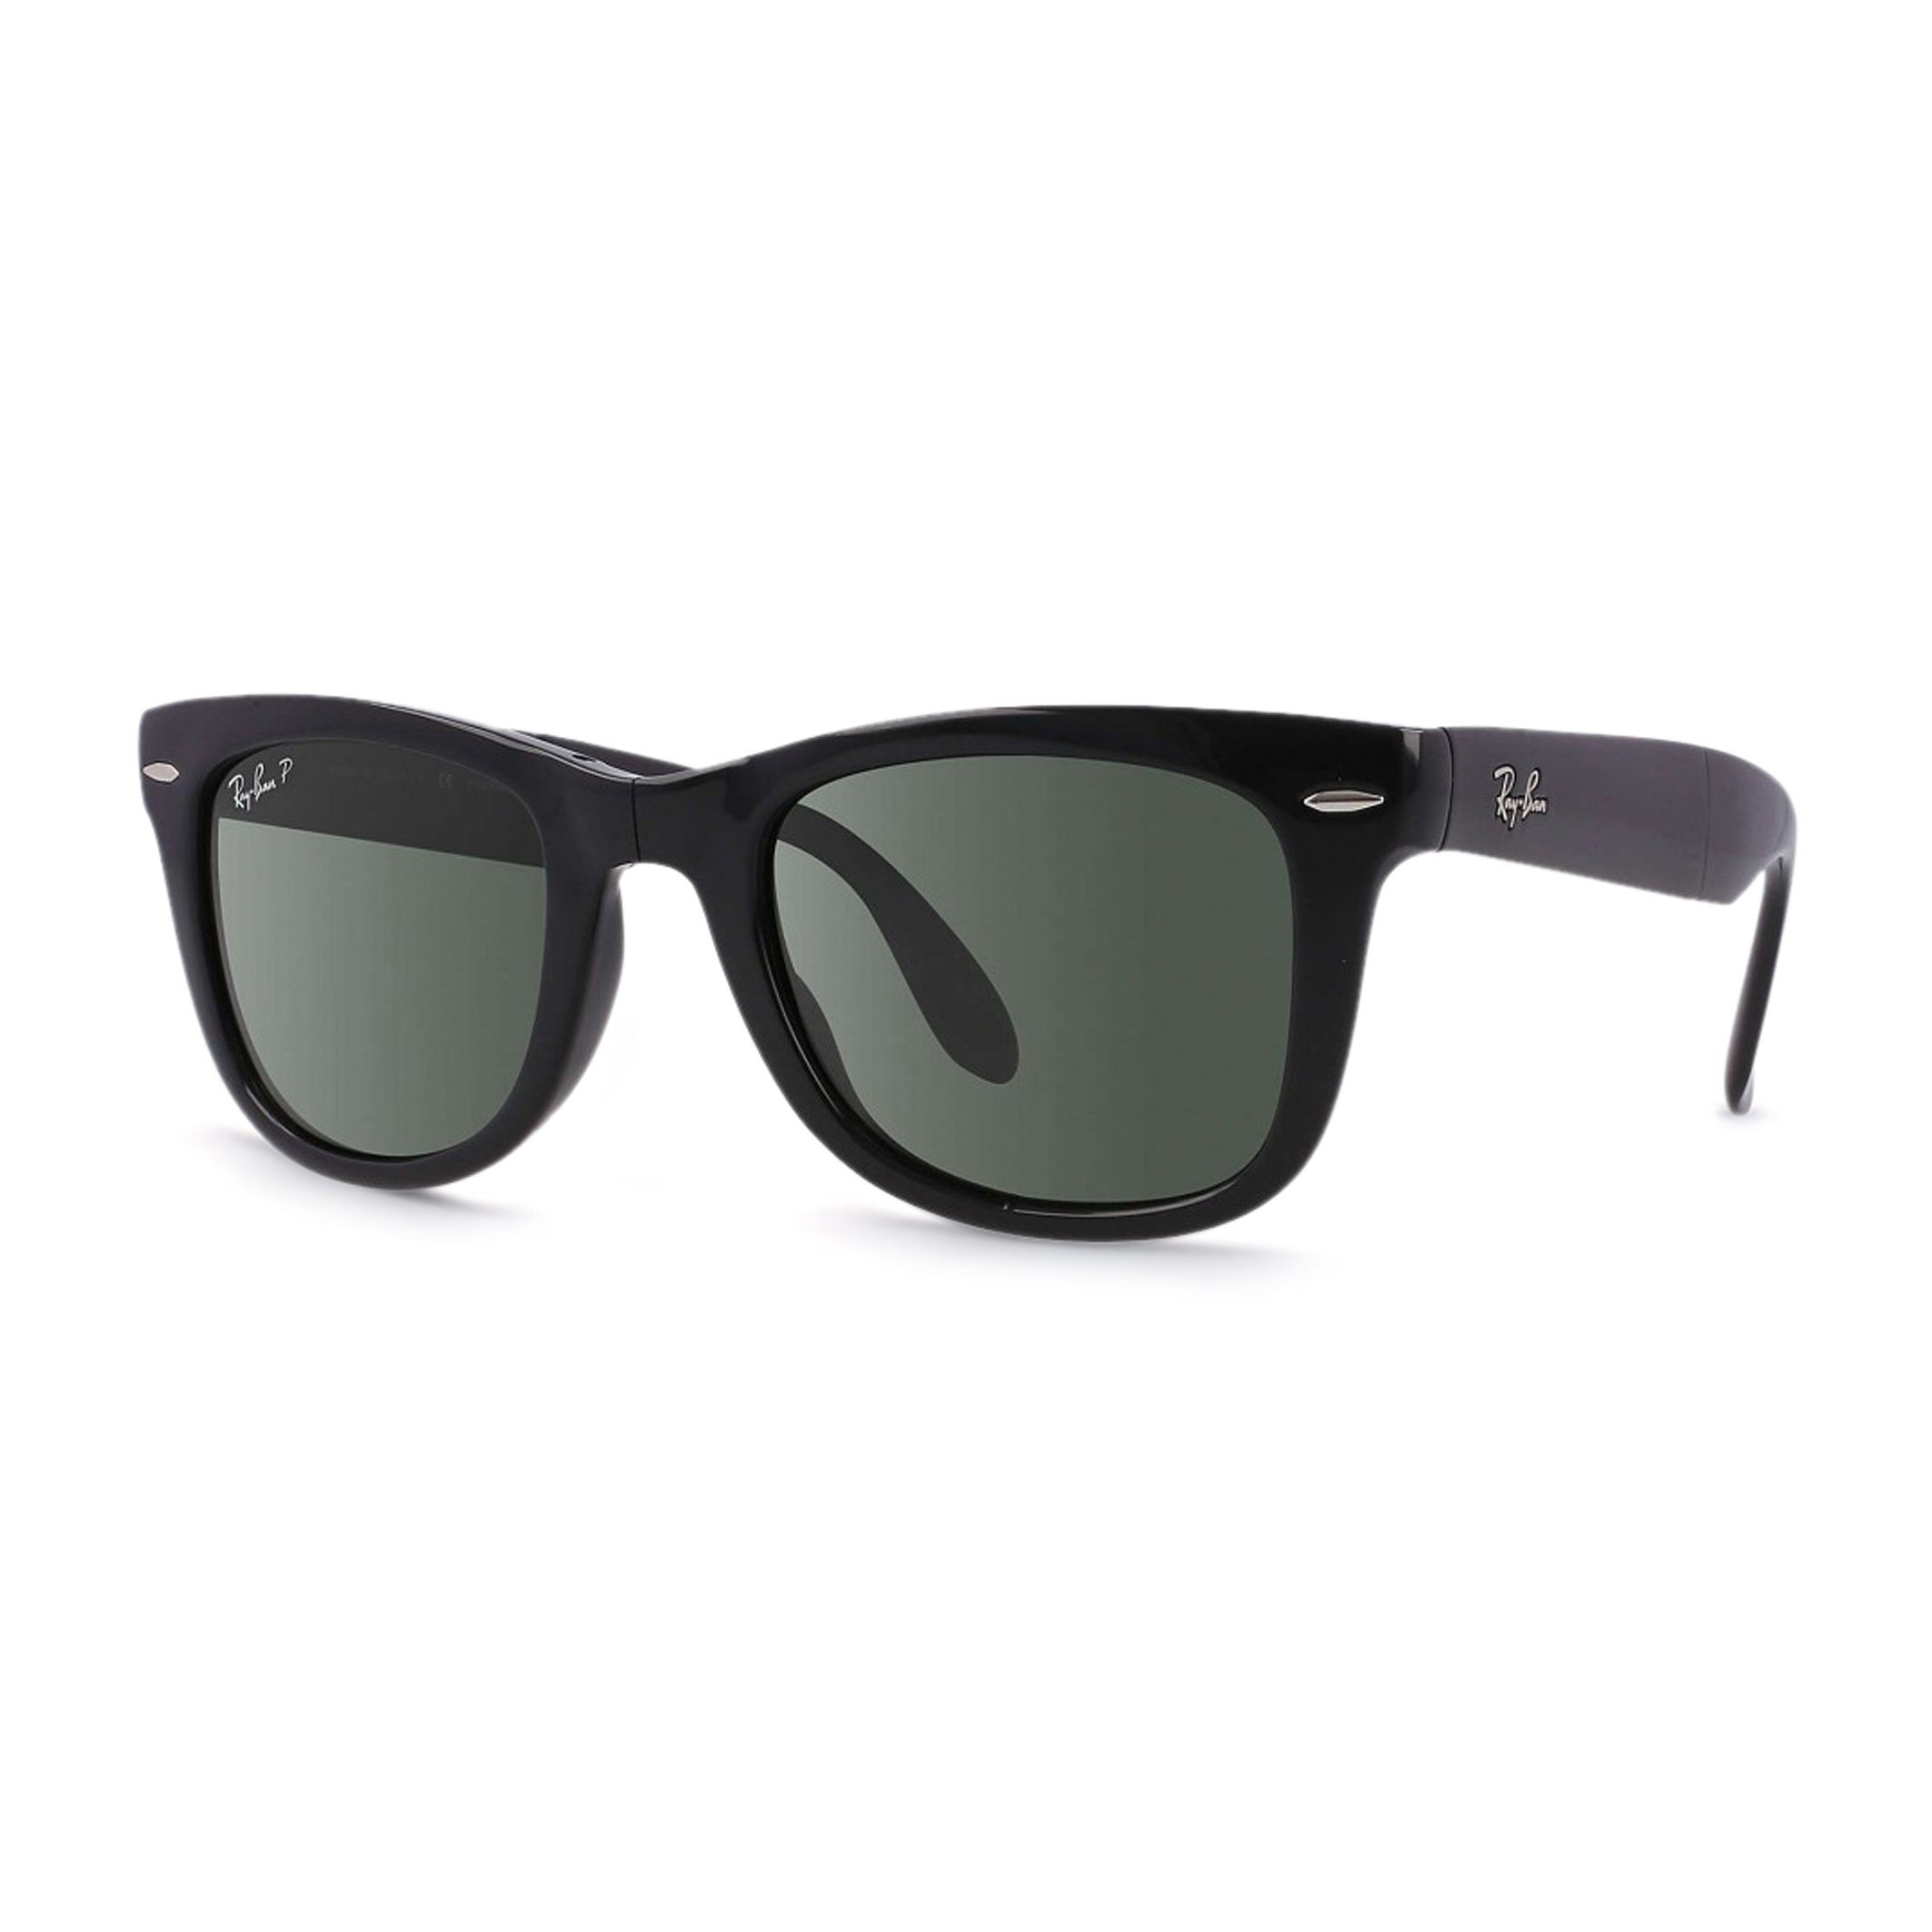 Ray-Ban Unisex Sunglasses Various Colours 0RB4105 - black NOSIZE